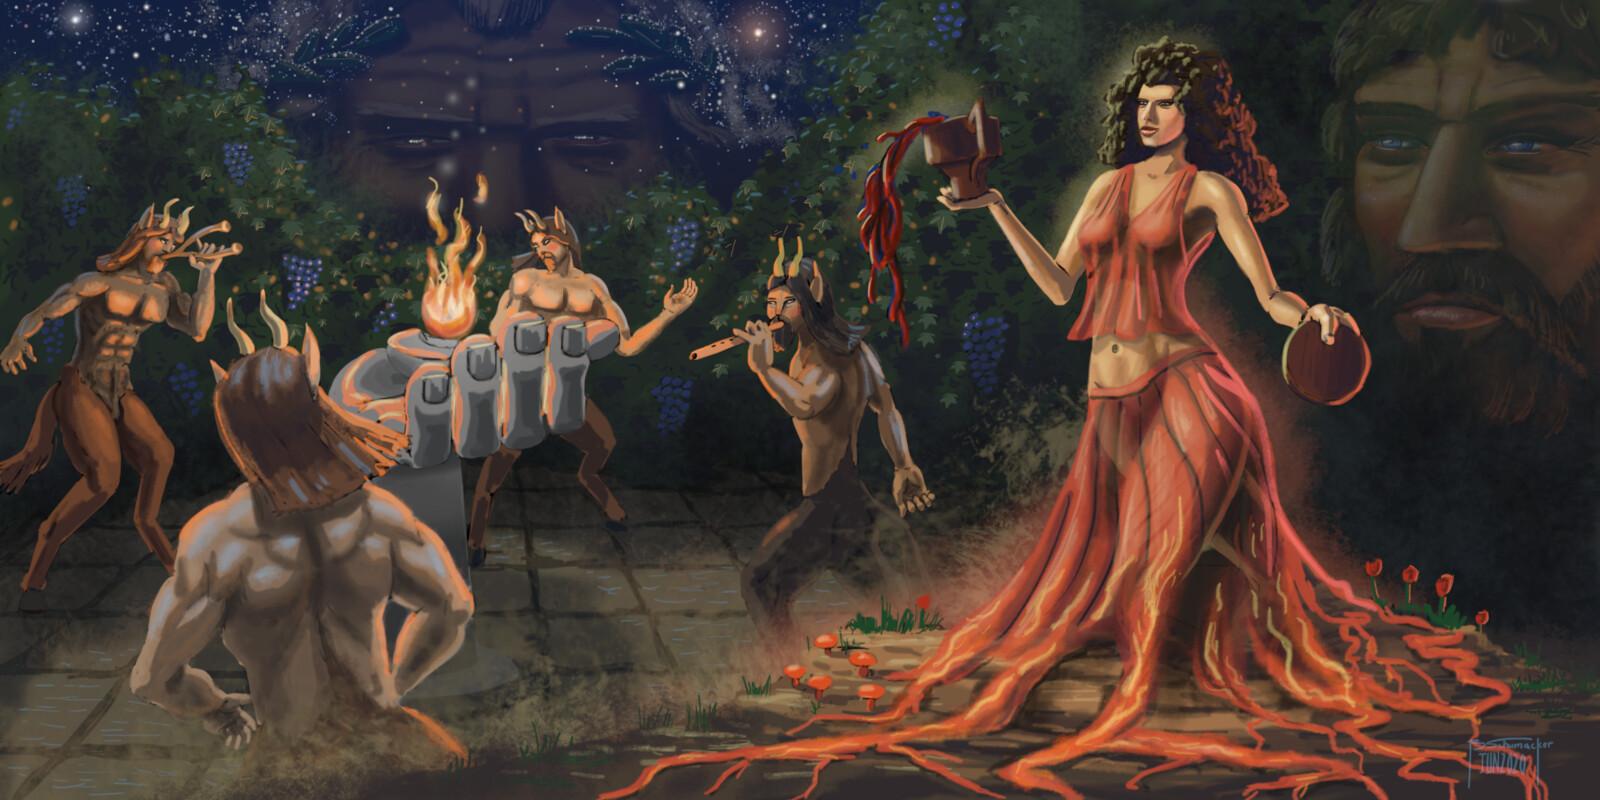 Pandora - The First Woman